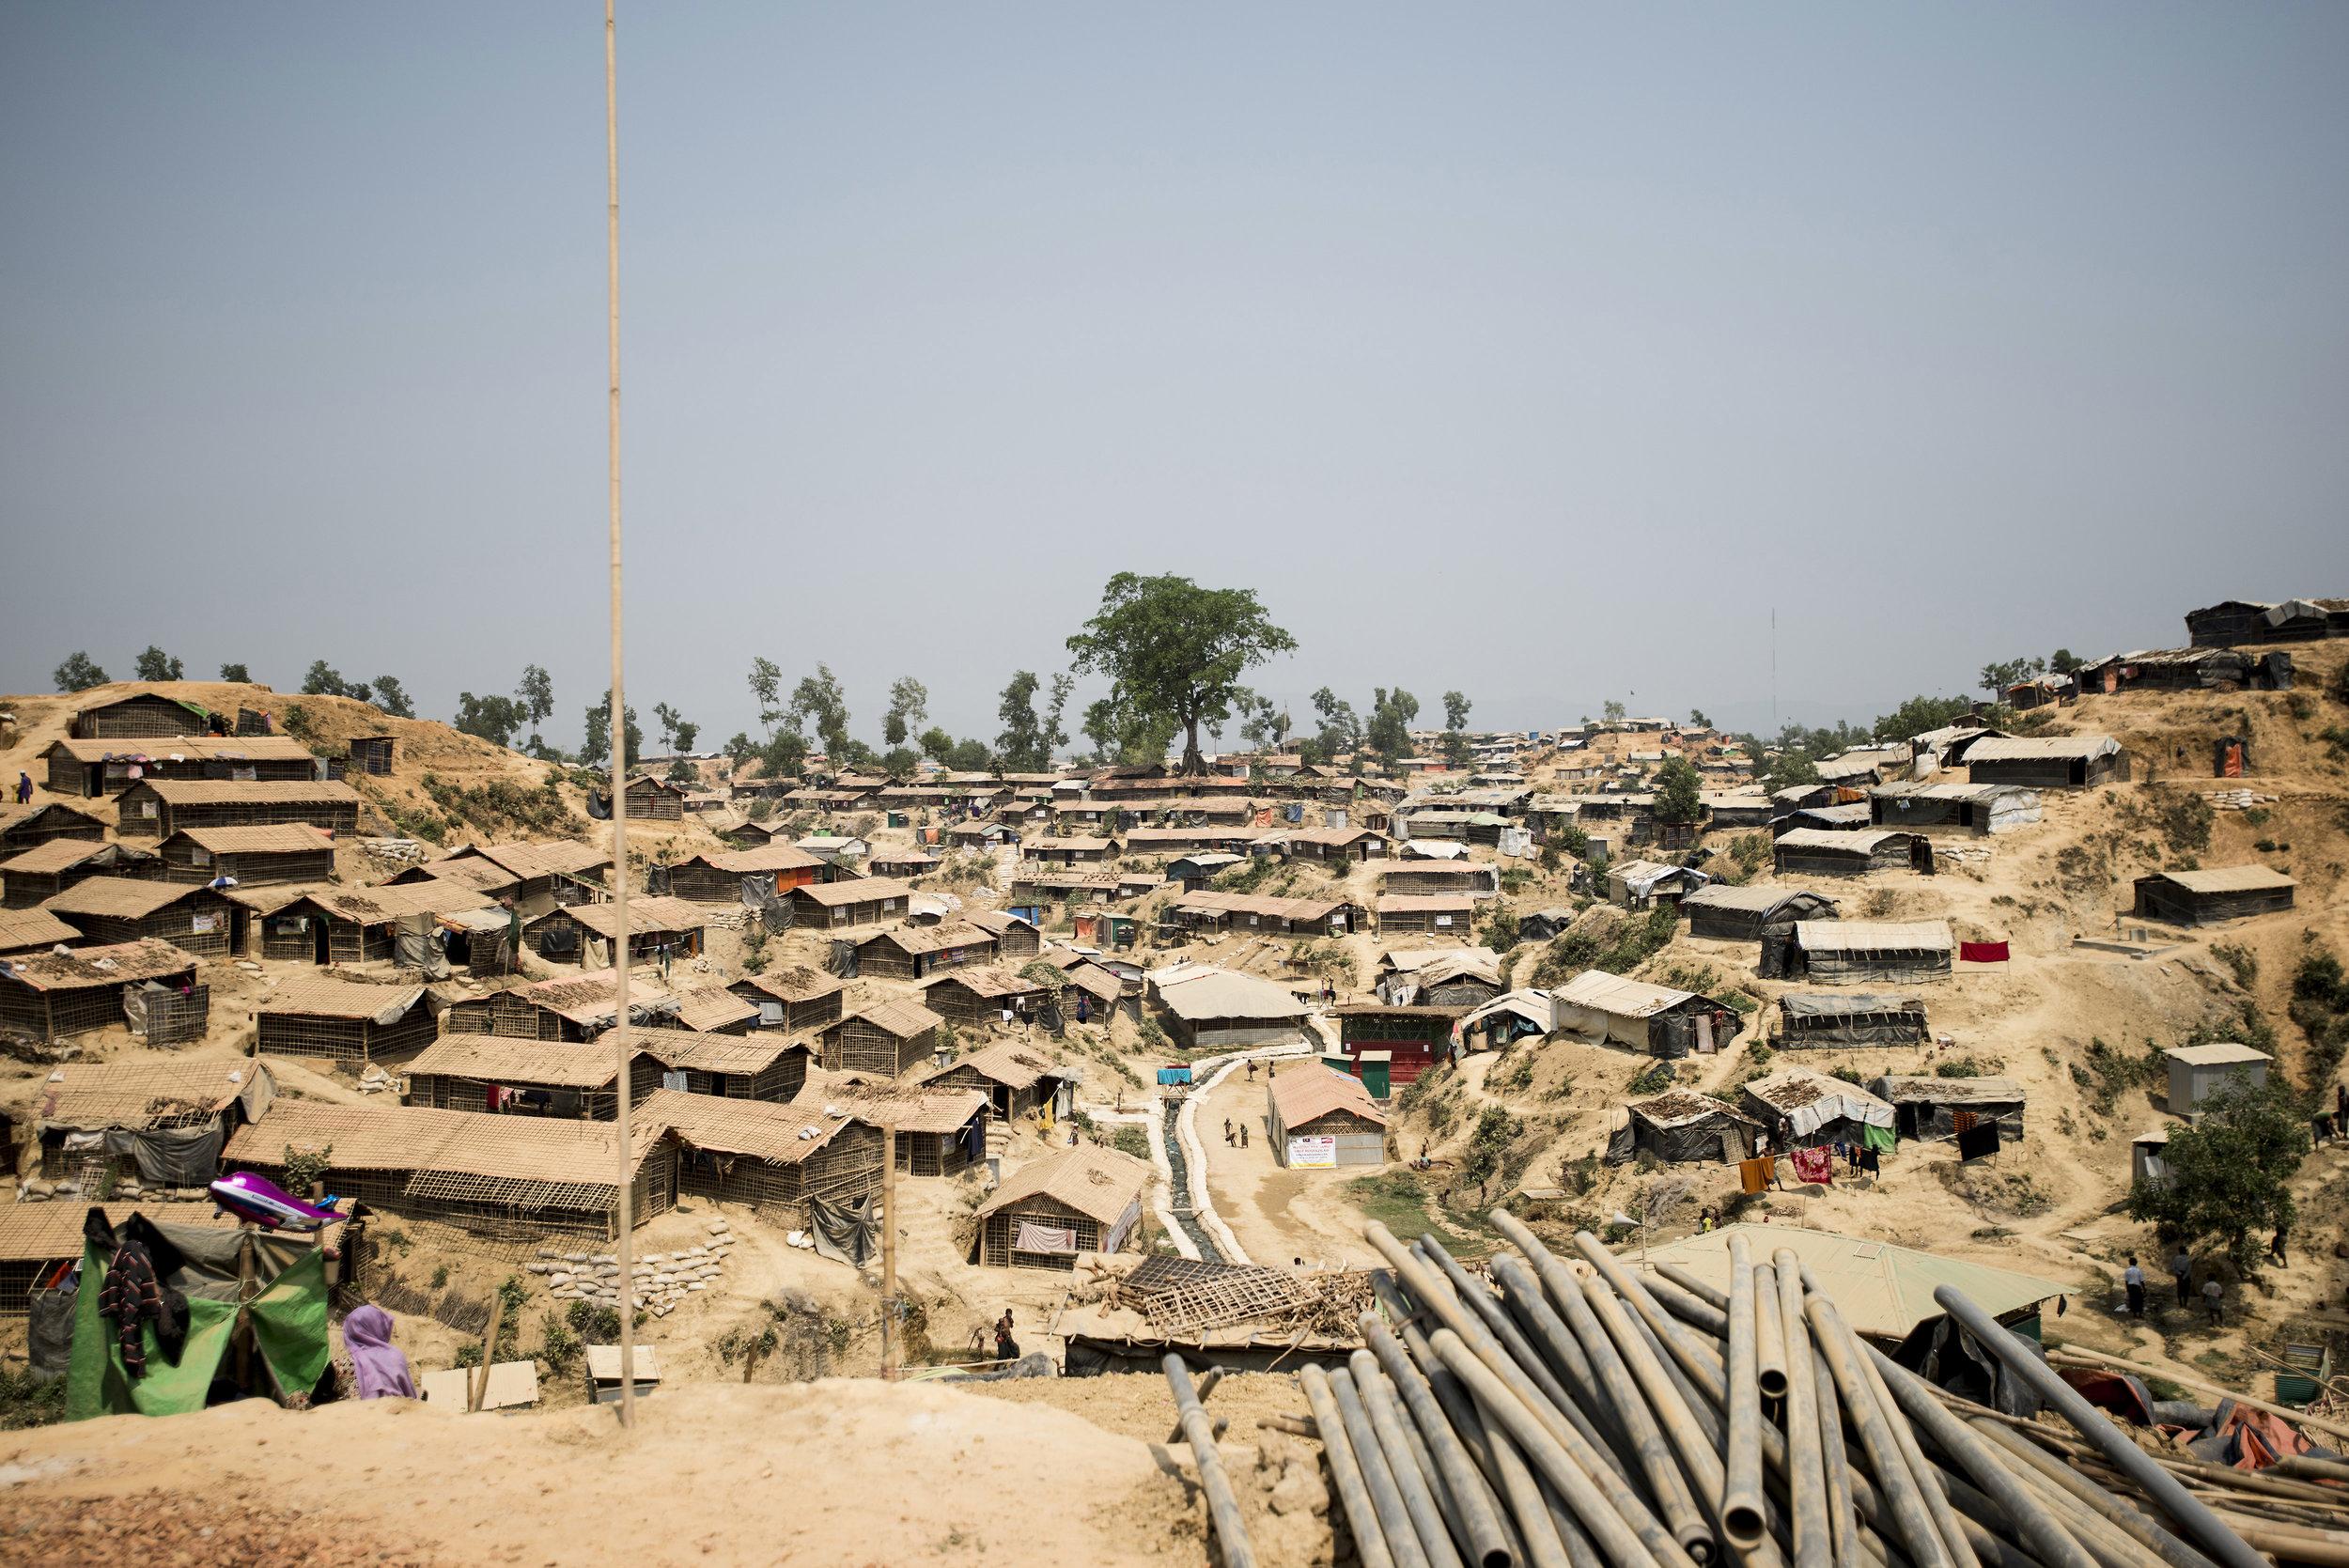 Kutupalong Refugee Camp. Cox's Bazar, Bangladesh. 2018.